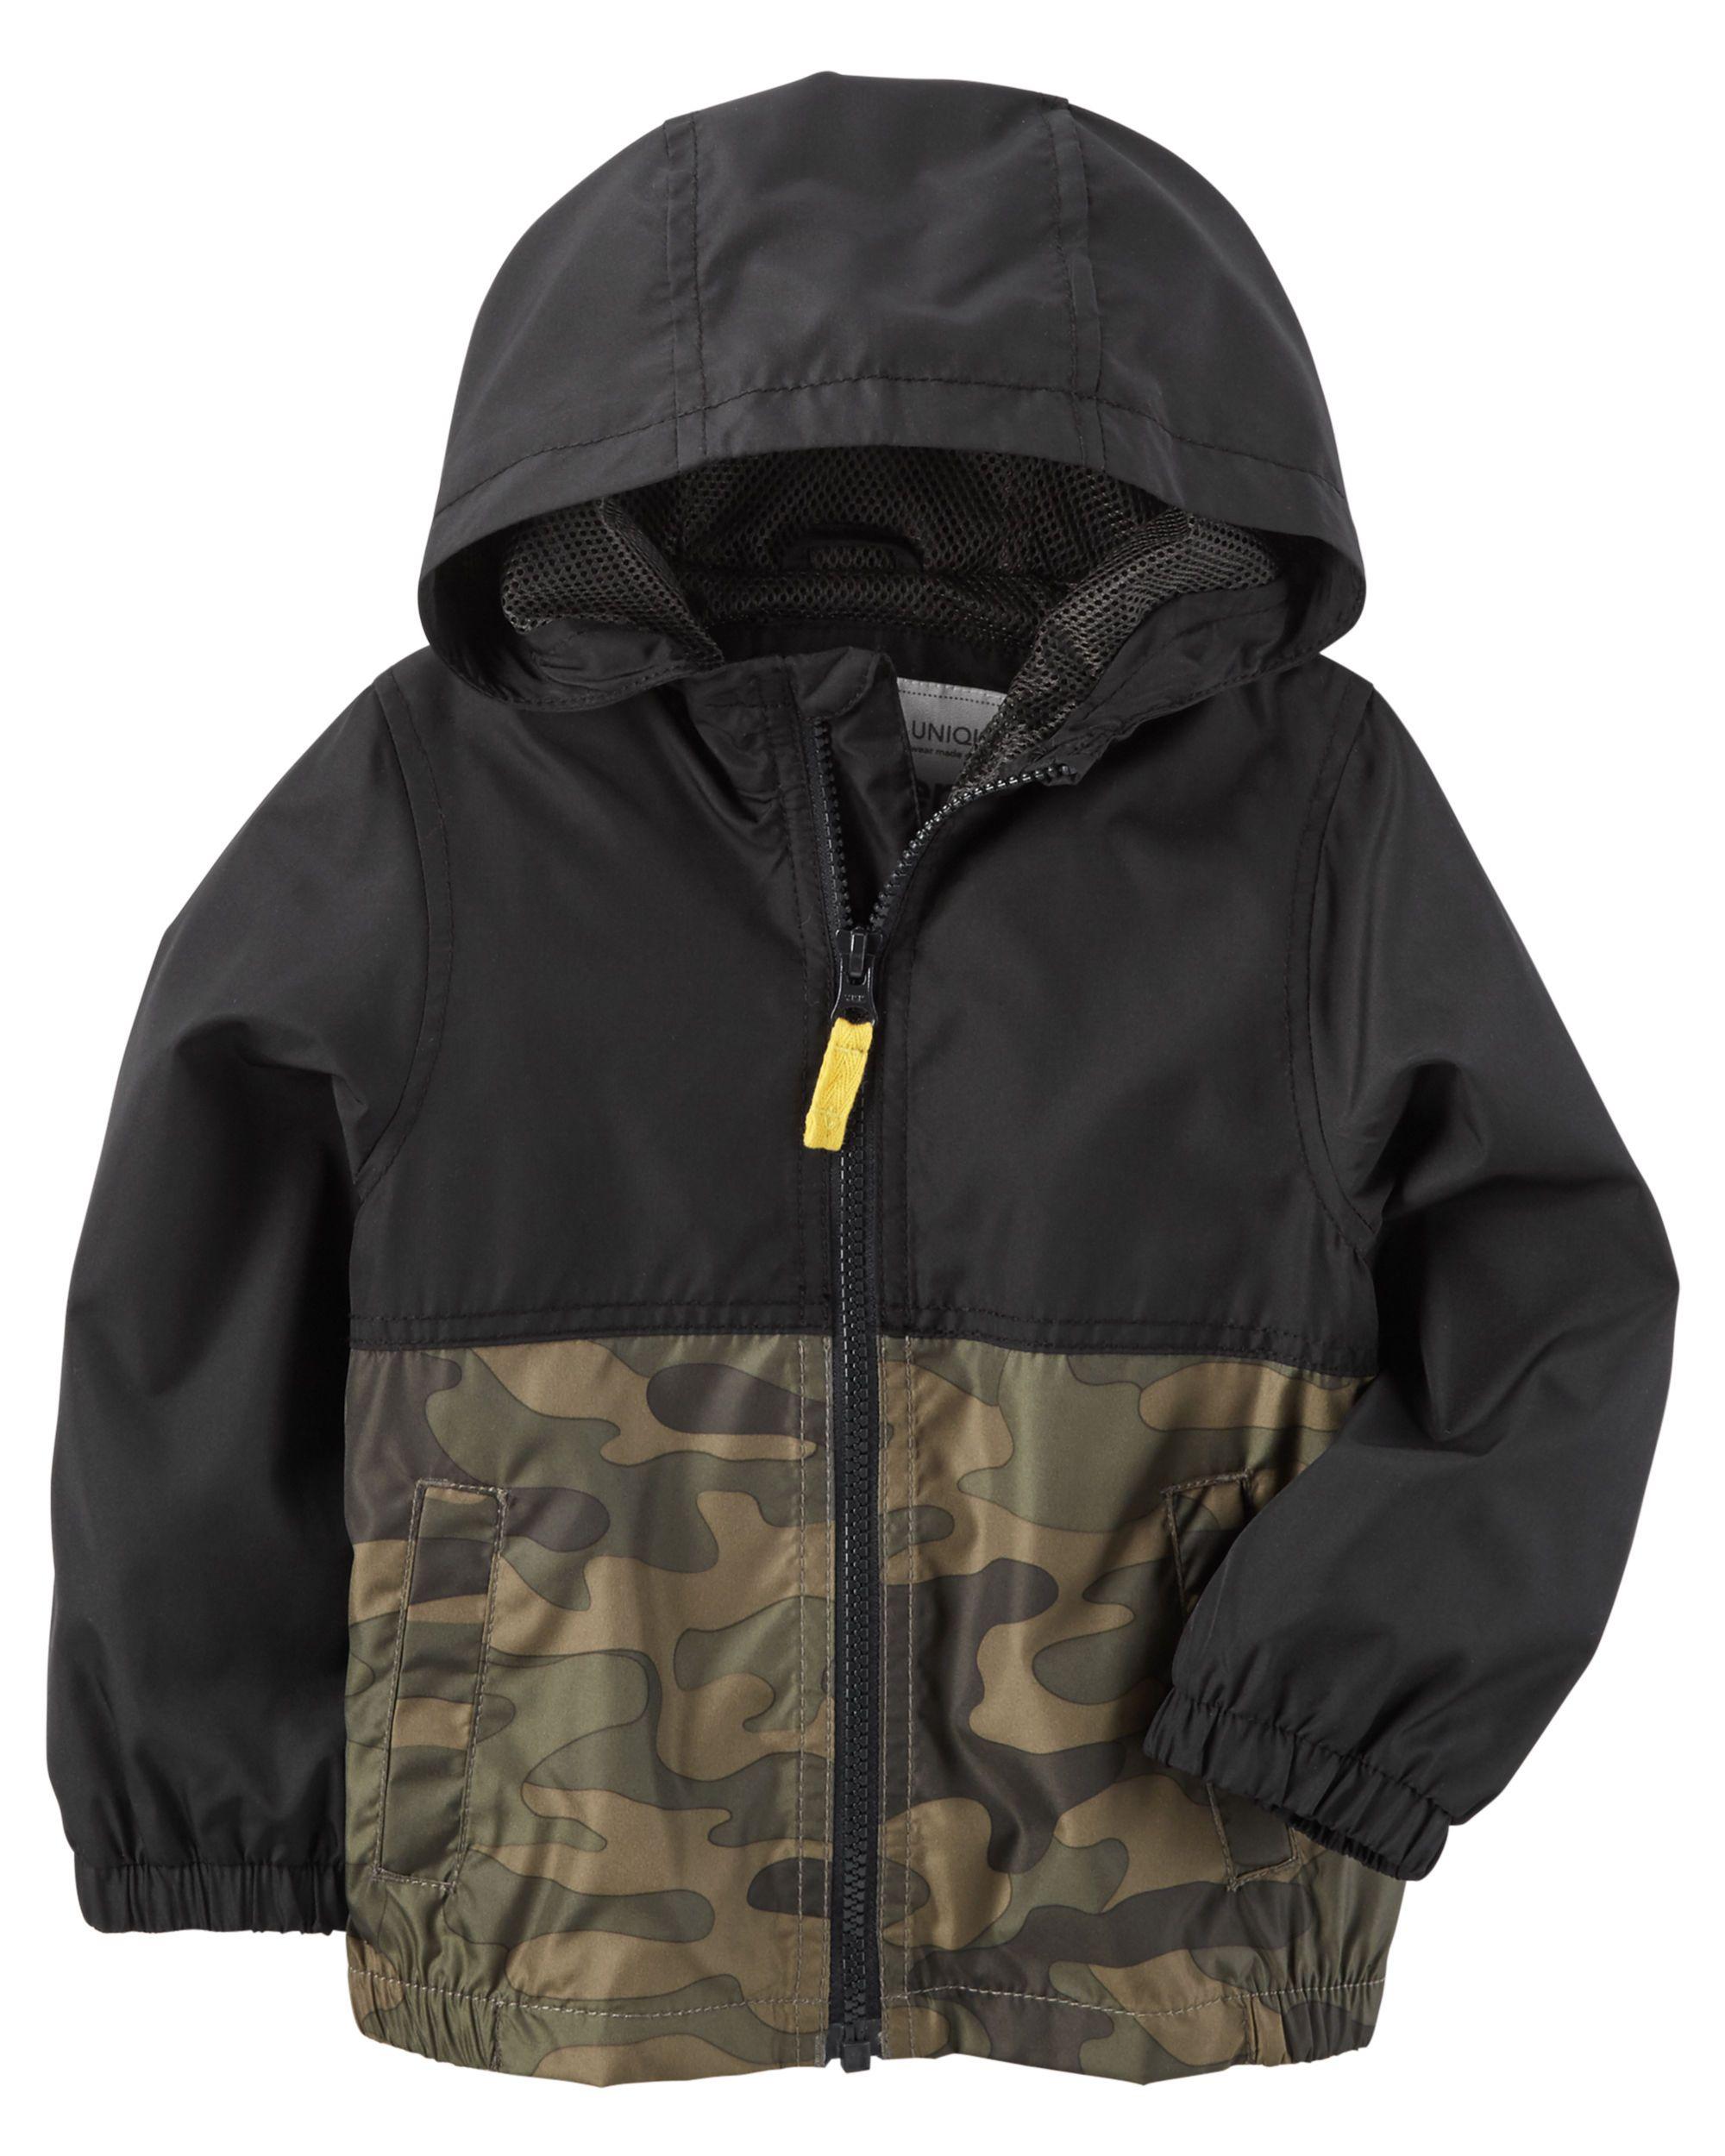 d1012cb90 Raglan Windbreaker | Clothes For My Nephew. | Baby boy jackets ...